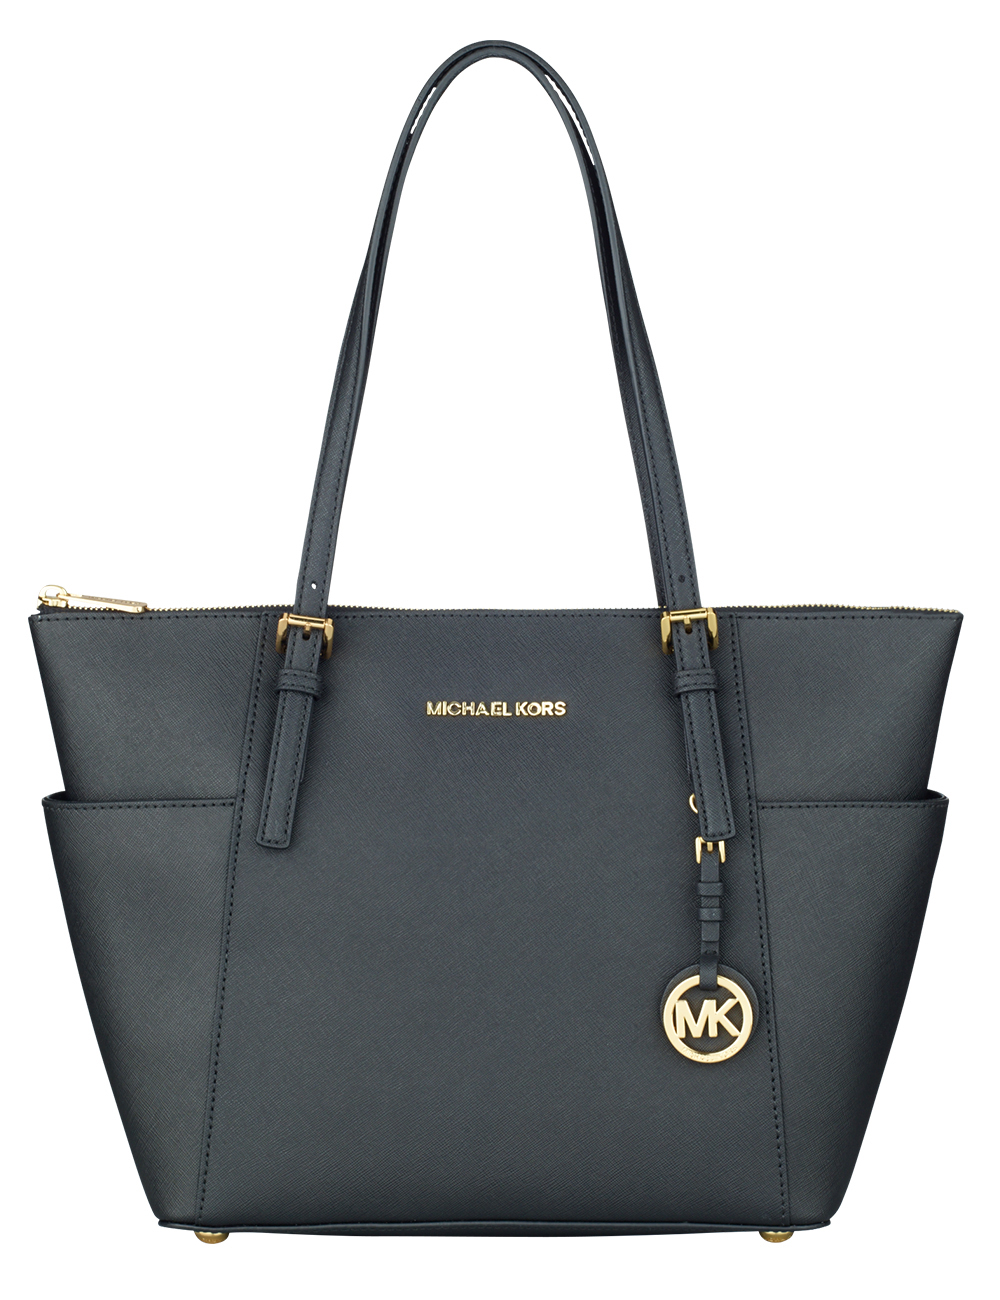 home mode accessoires handtasche von michael kors schwarz. Black Bedroom Furniture Sets. Home Design Ideas